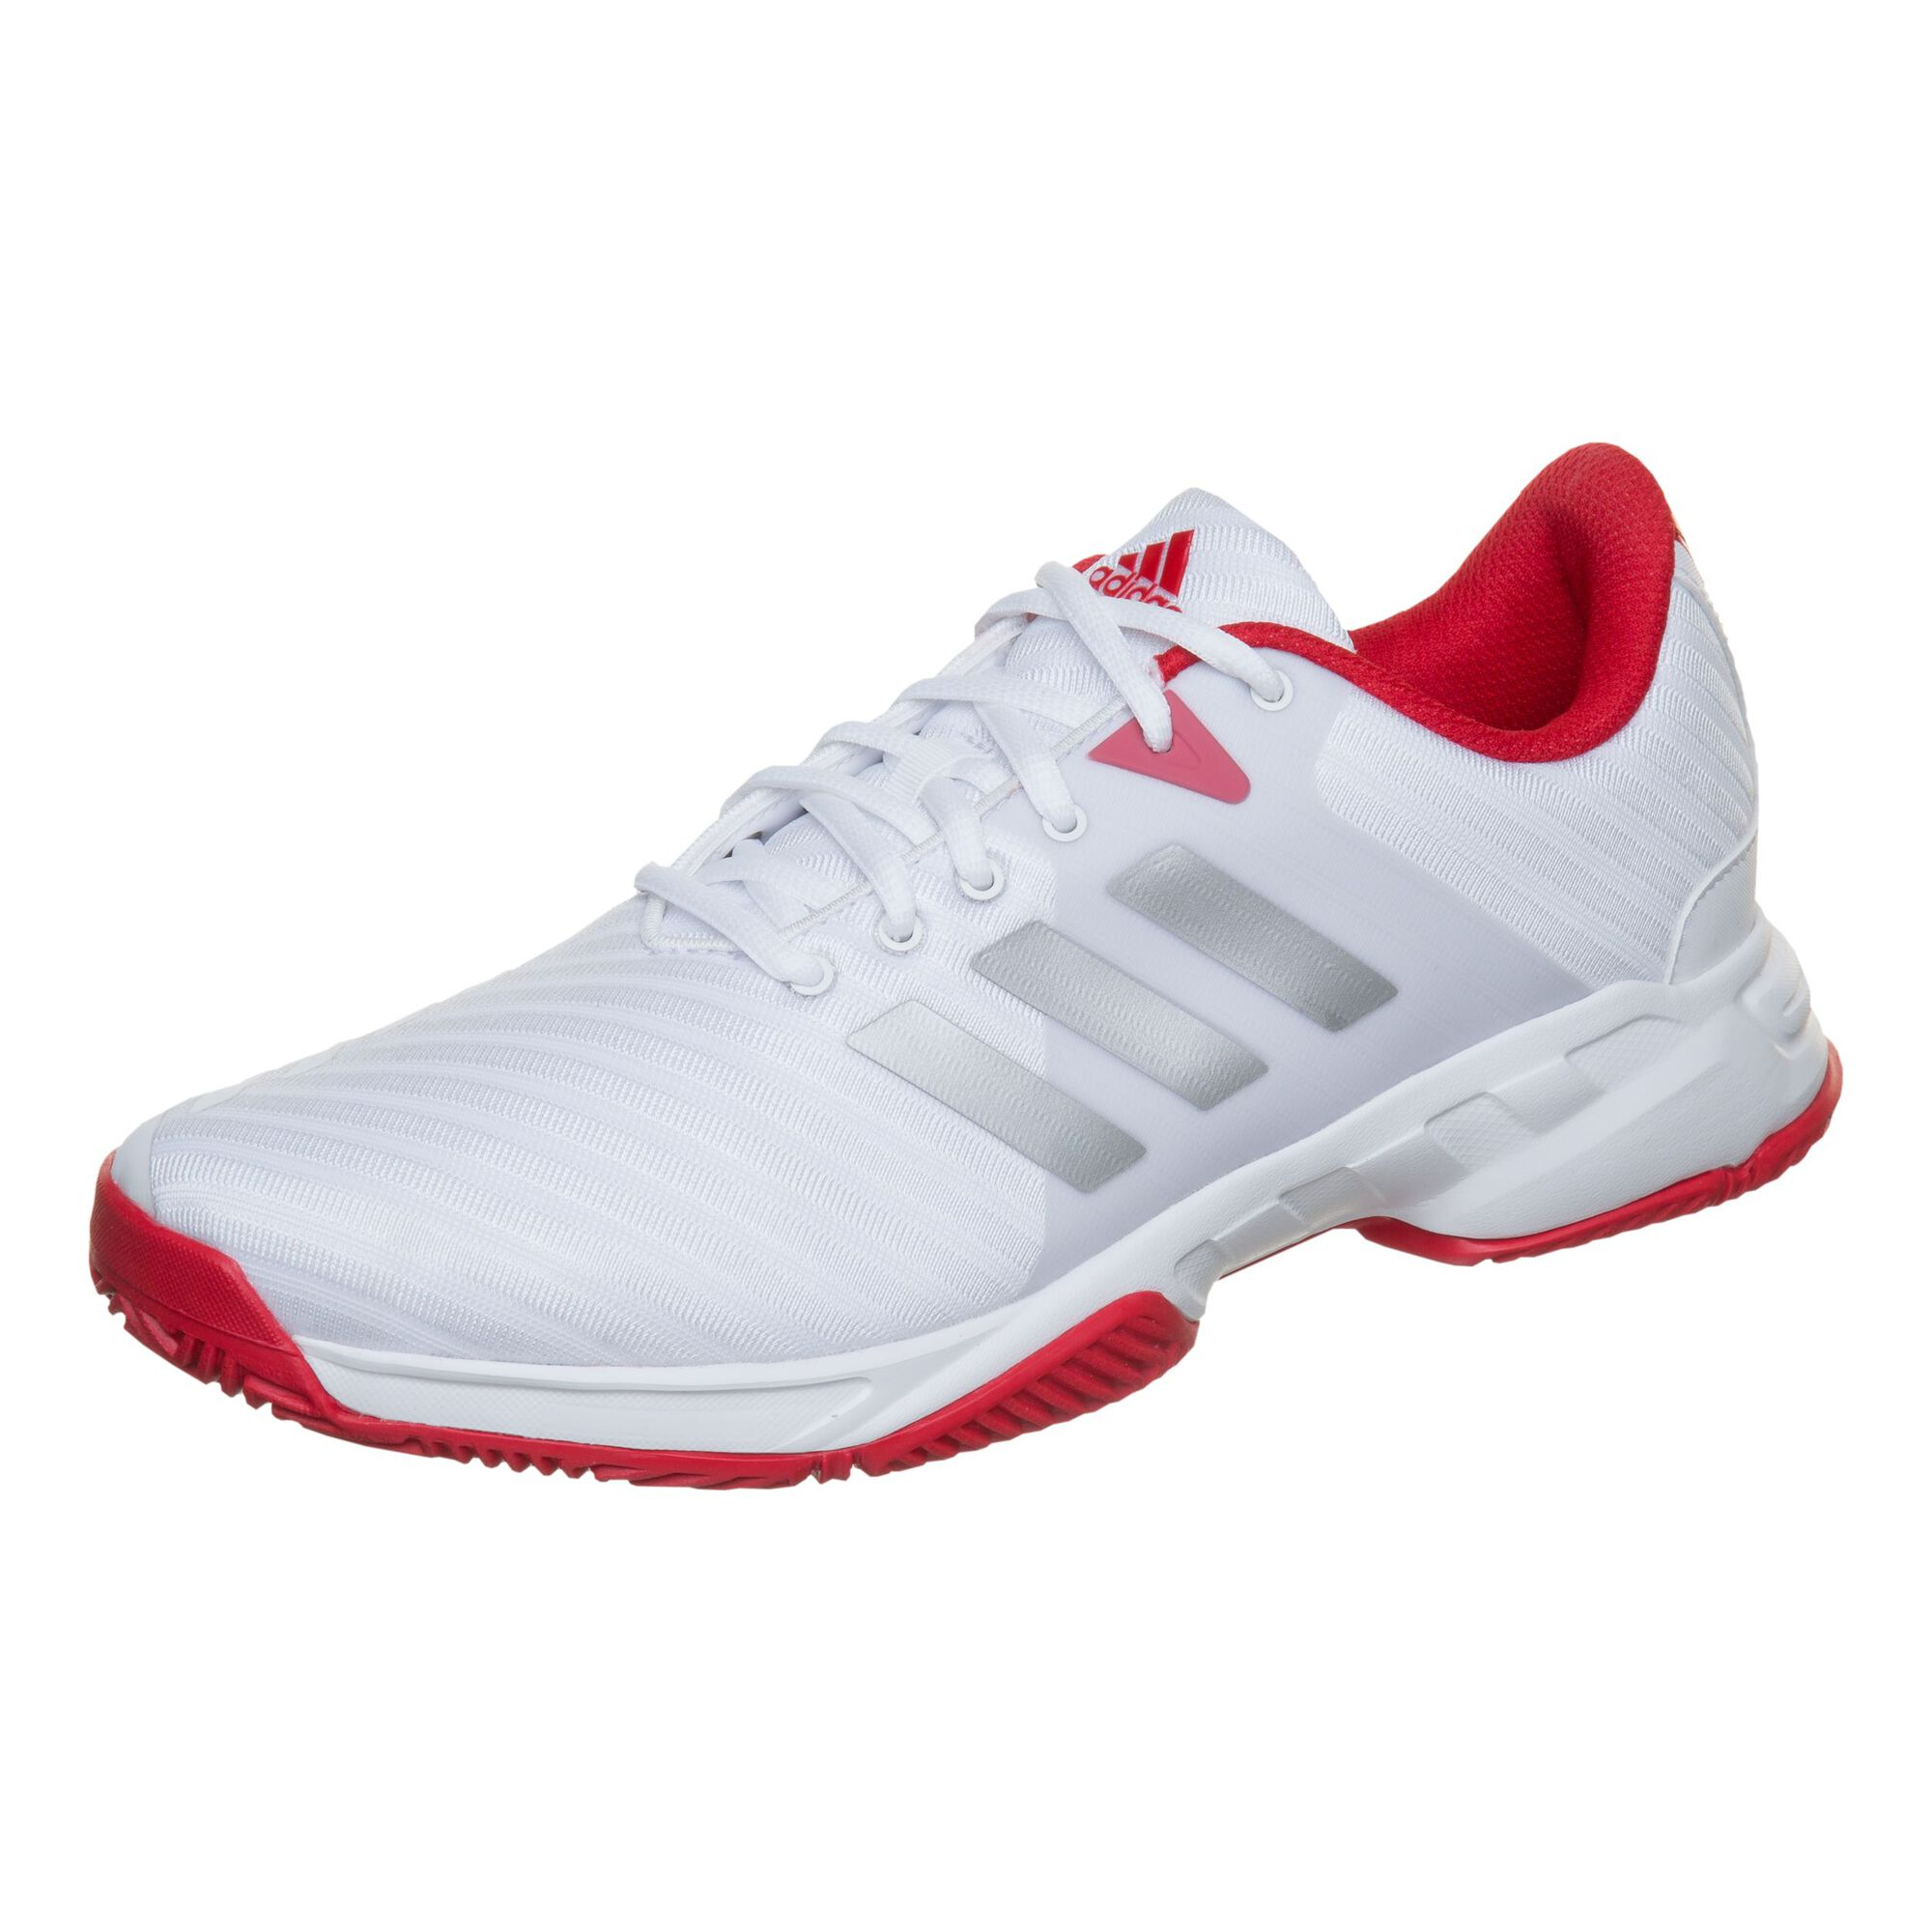 new product 5ce9e 2a590 adidas · adidas · adidas · adidas · adidas · adidas · adidas · adidas ·  adidas · adidas. Barricade Court 3 ...